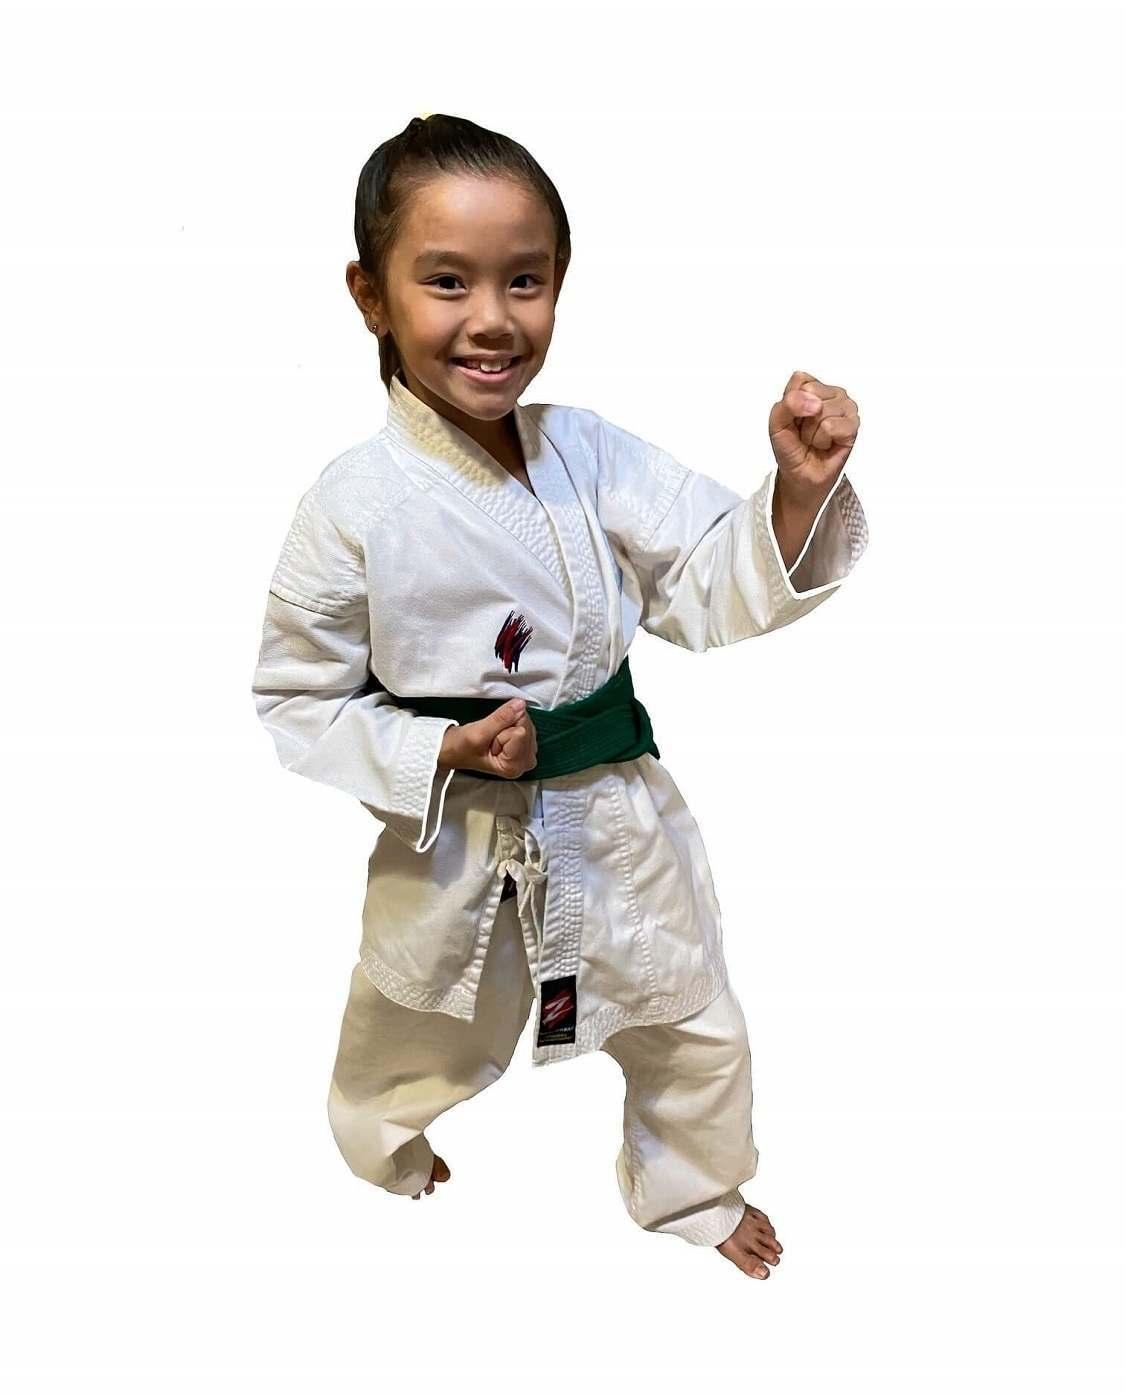 Best taekwondo school in Lee's Summit Missouri - Prime Taekwondo School Lee's Summit Missouri